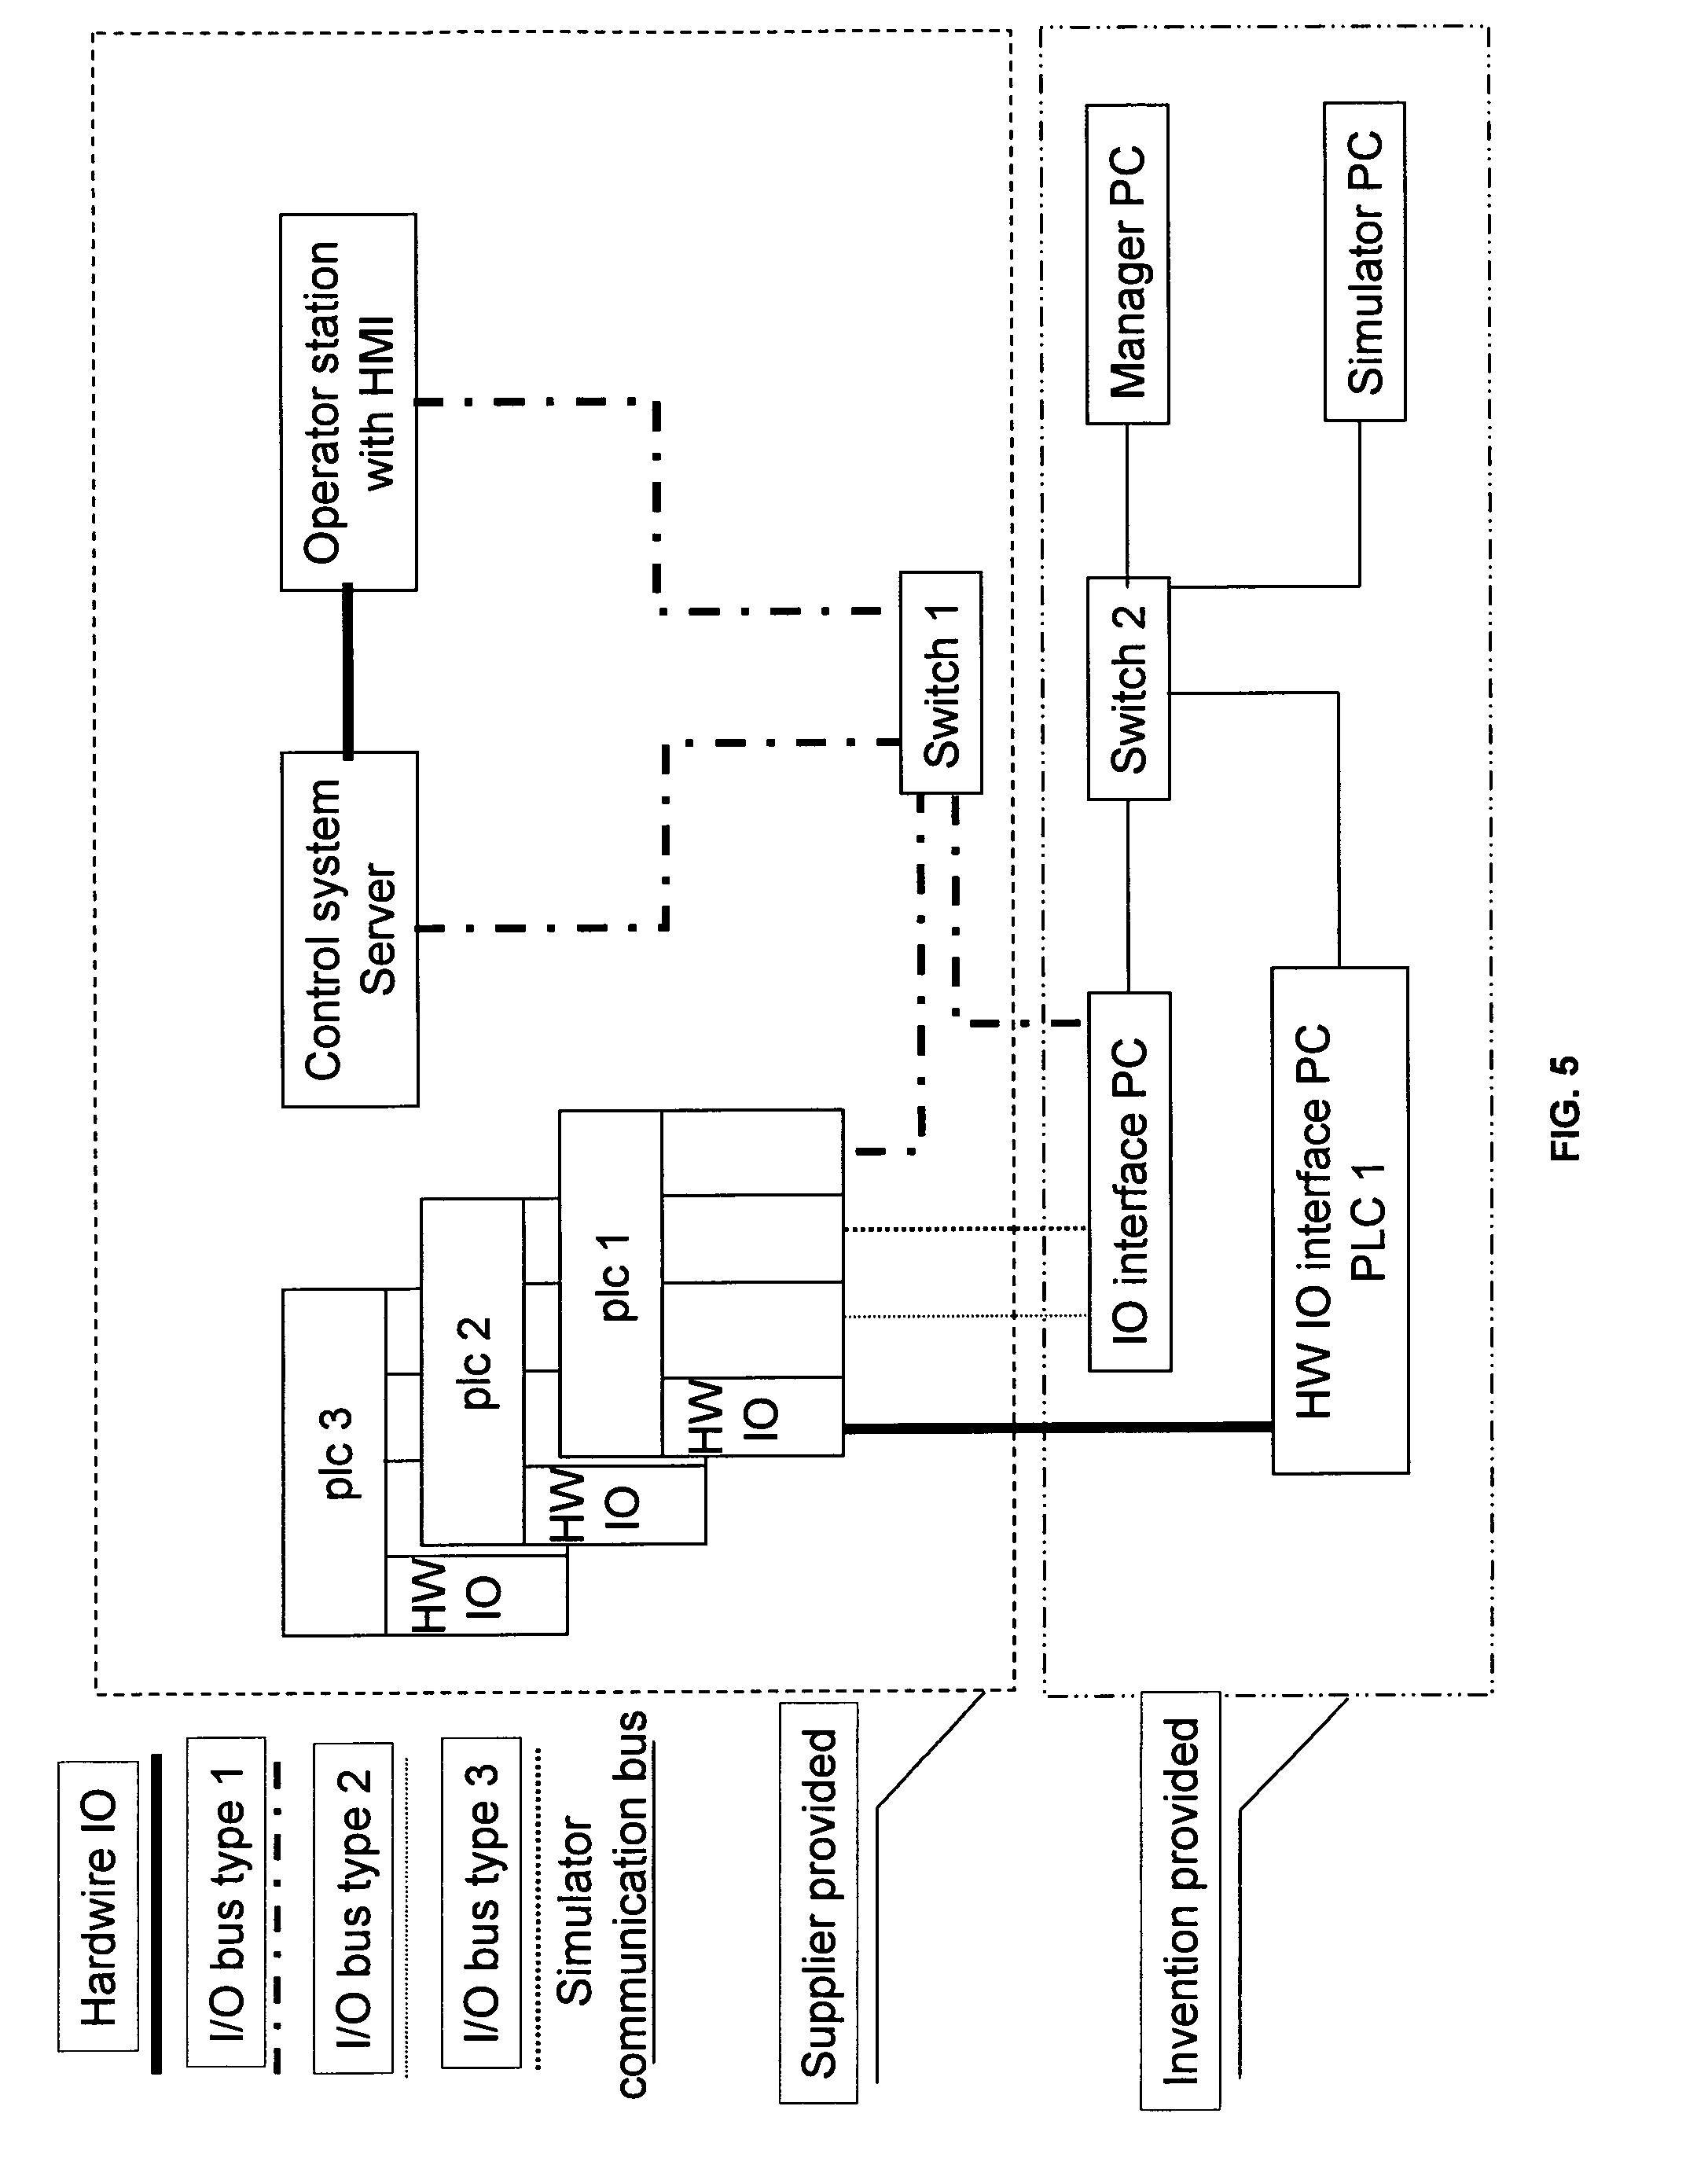 Anatomy Axillary And Maganement Wiring Diagram